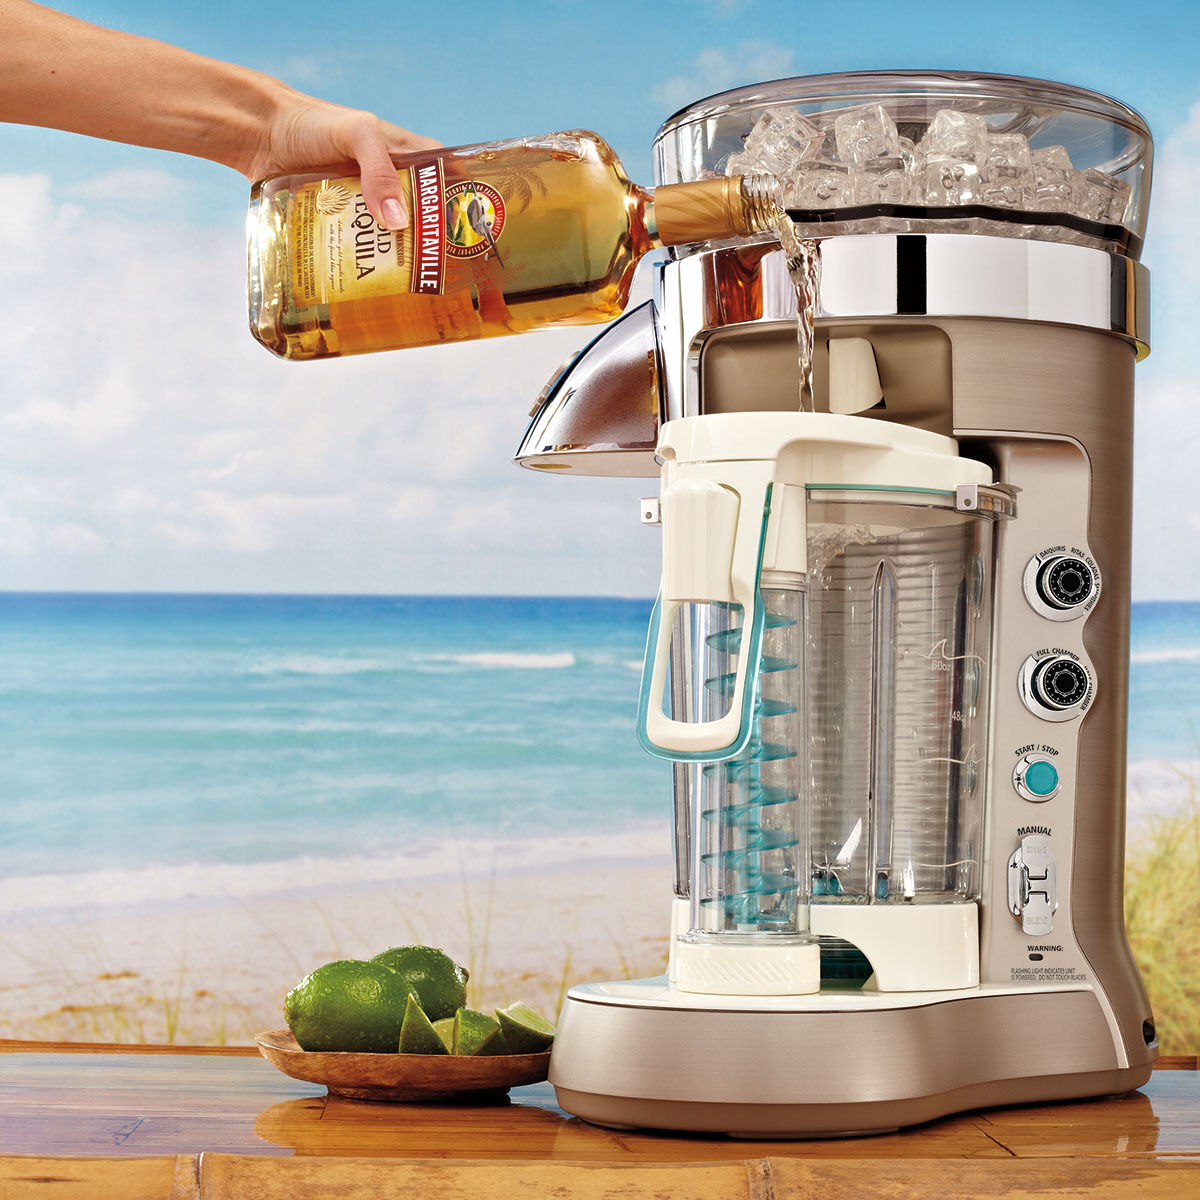 Margaritaville Bali Frozen Concoction Maker- Dm3500 | eBay